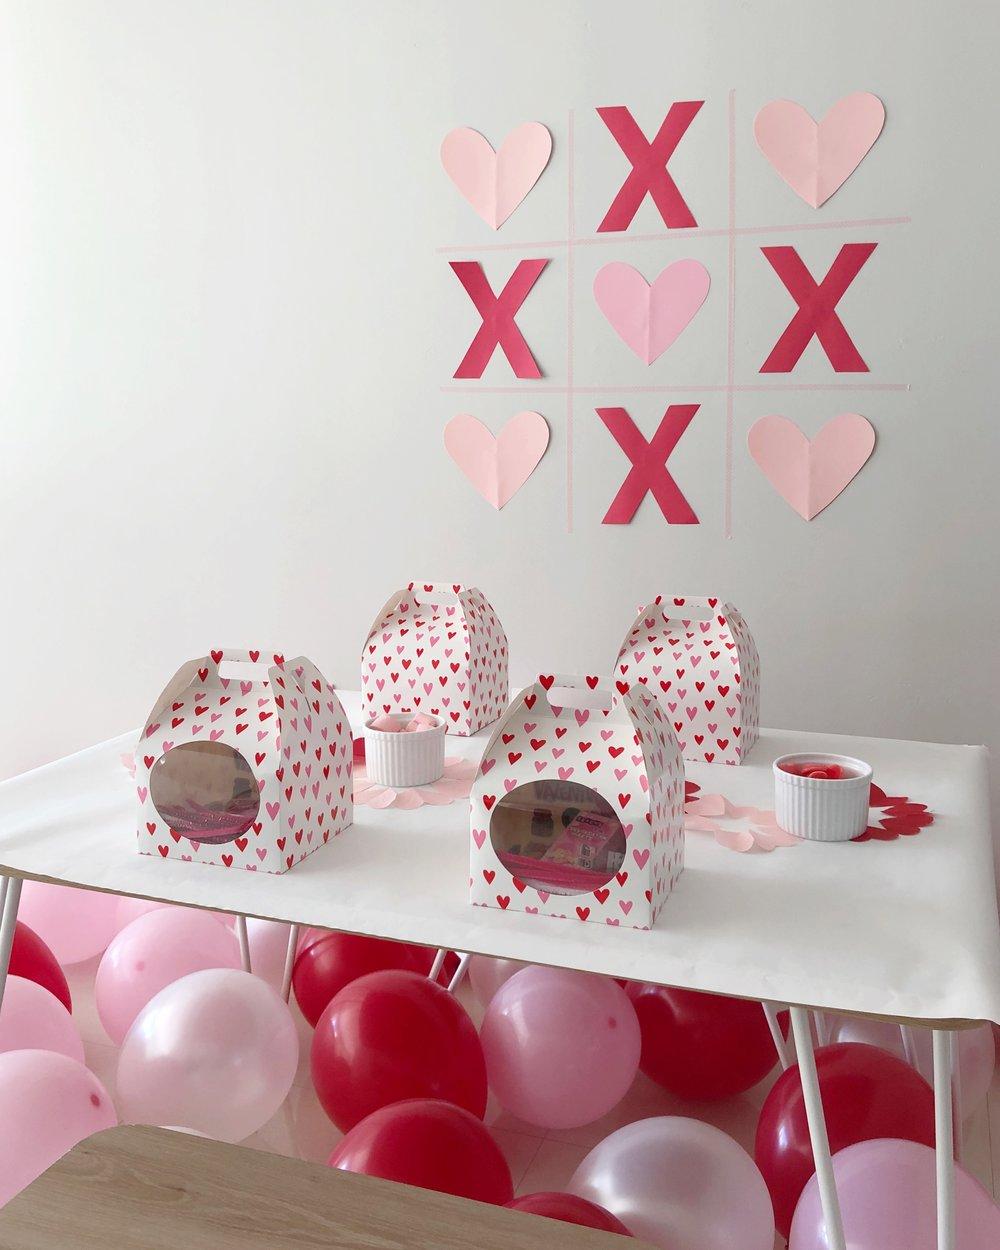 Simple Valentine Party on meethaha.com